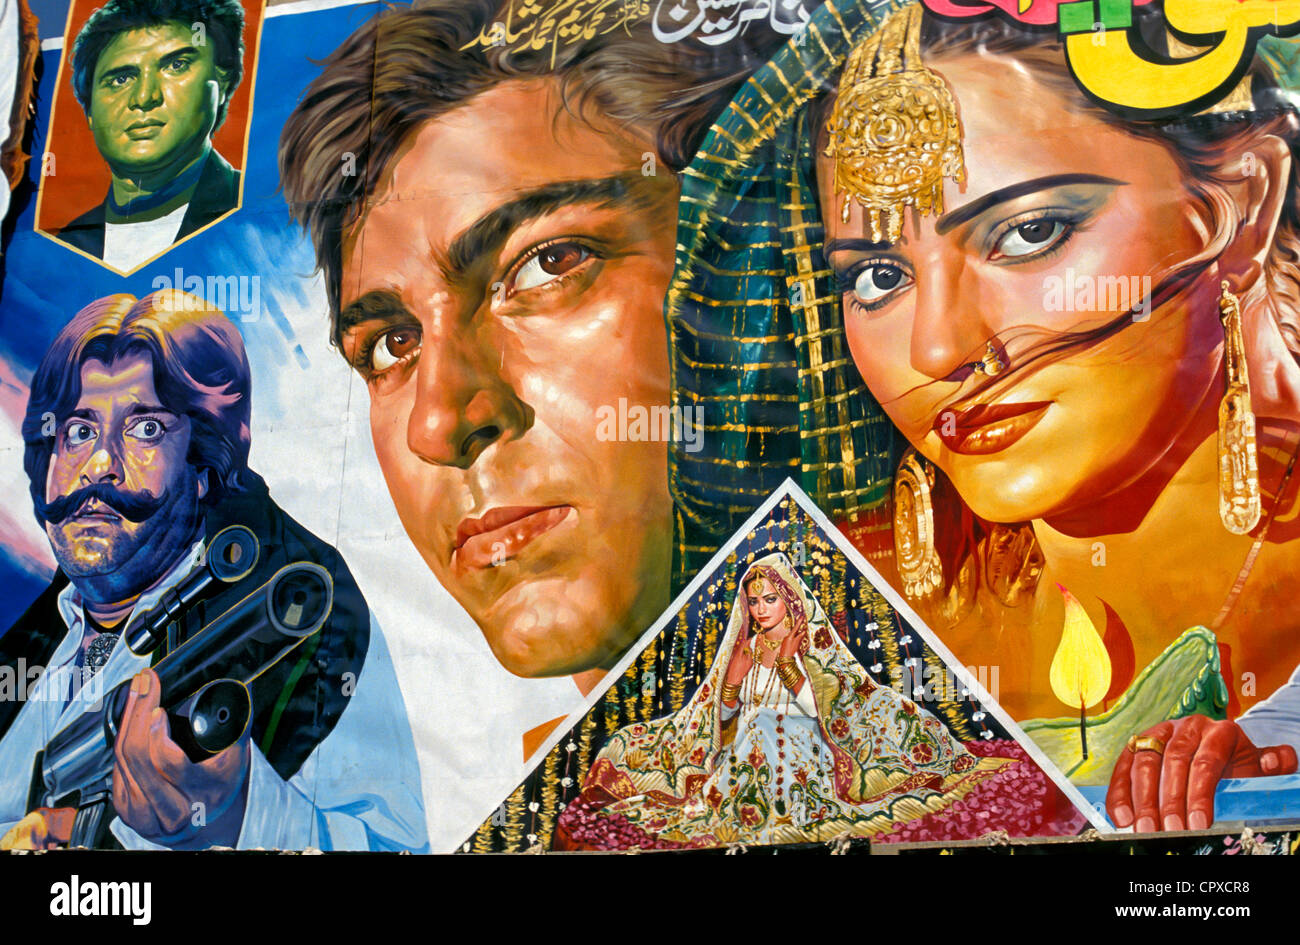 Pakistan, Lahore, cinema, cinema poster - Stock Image